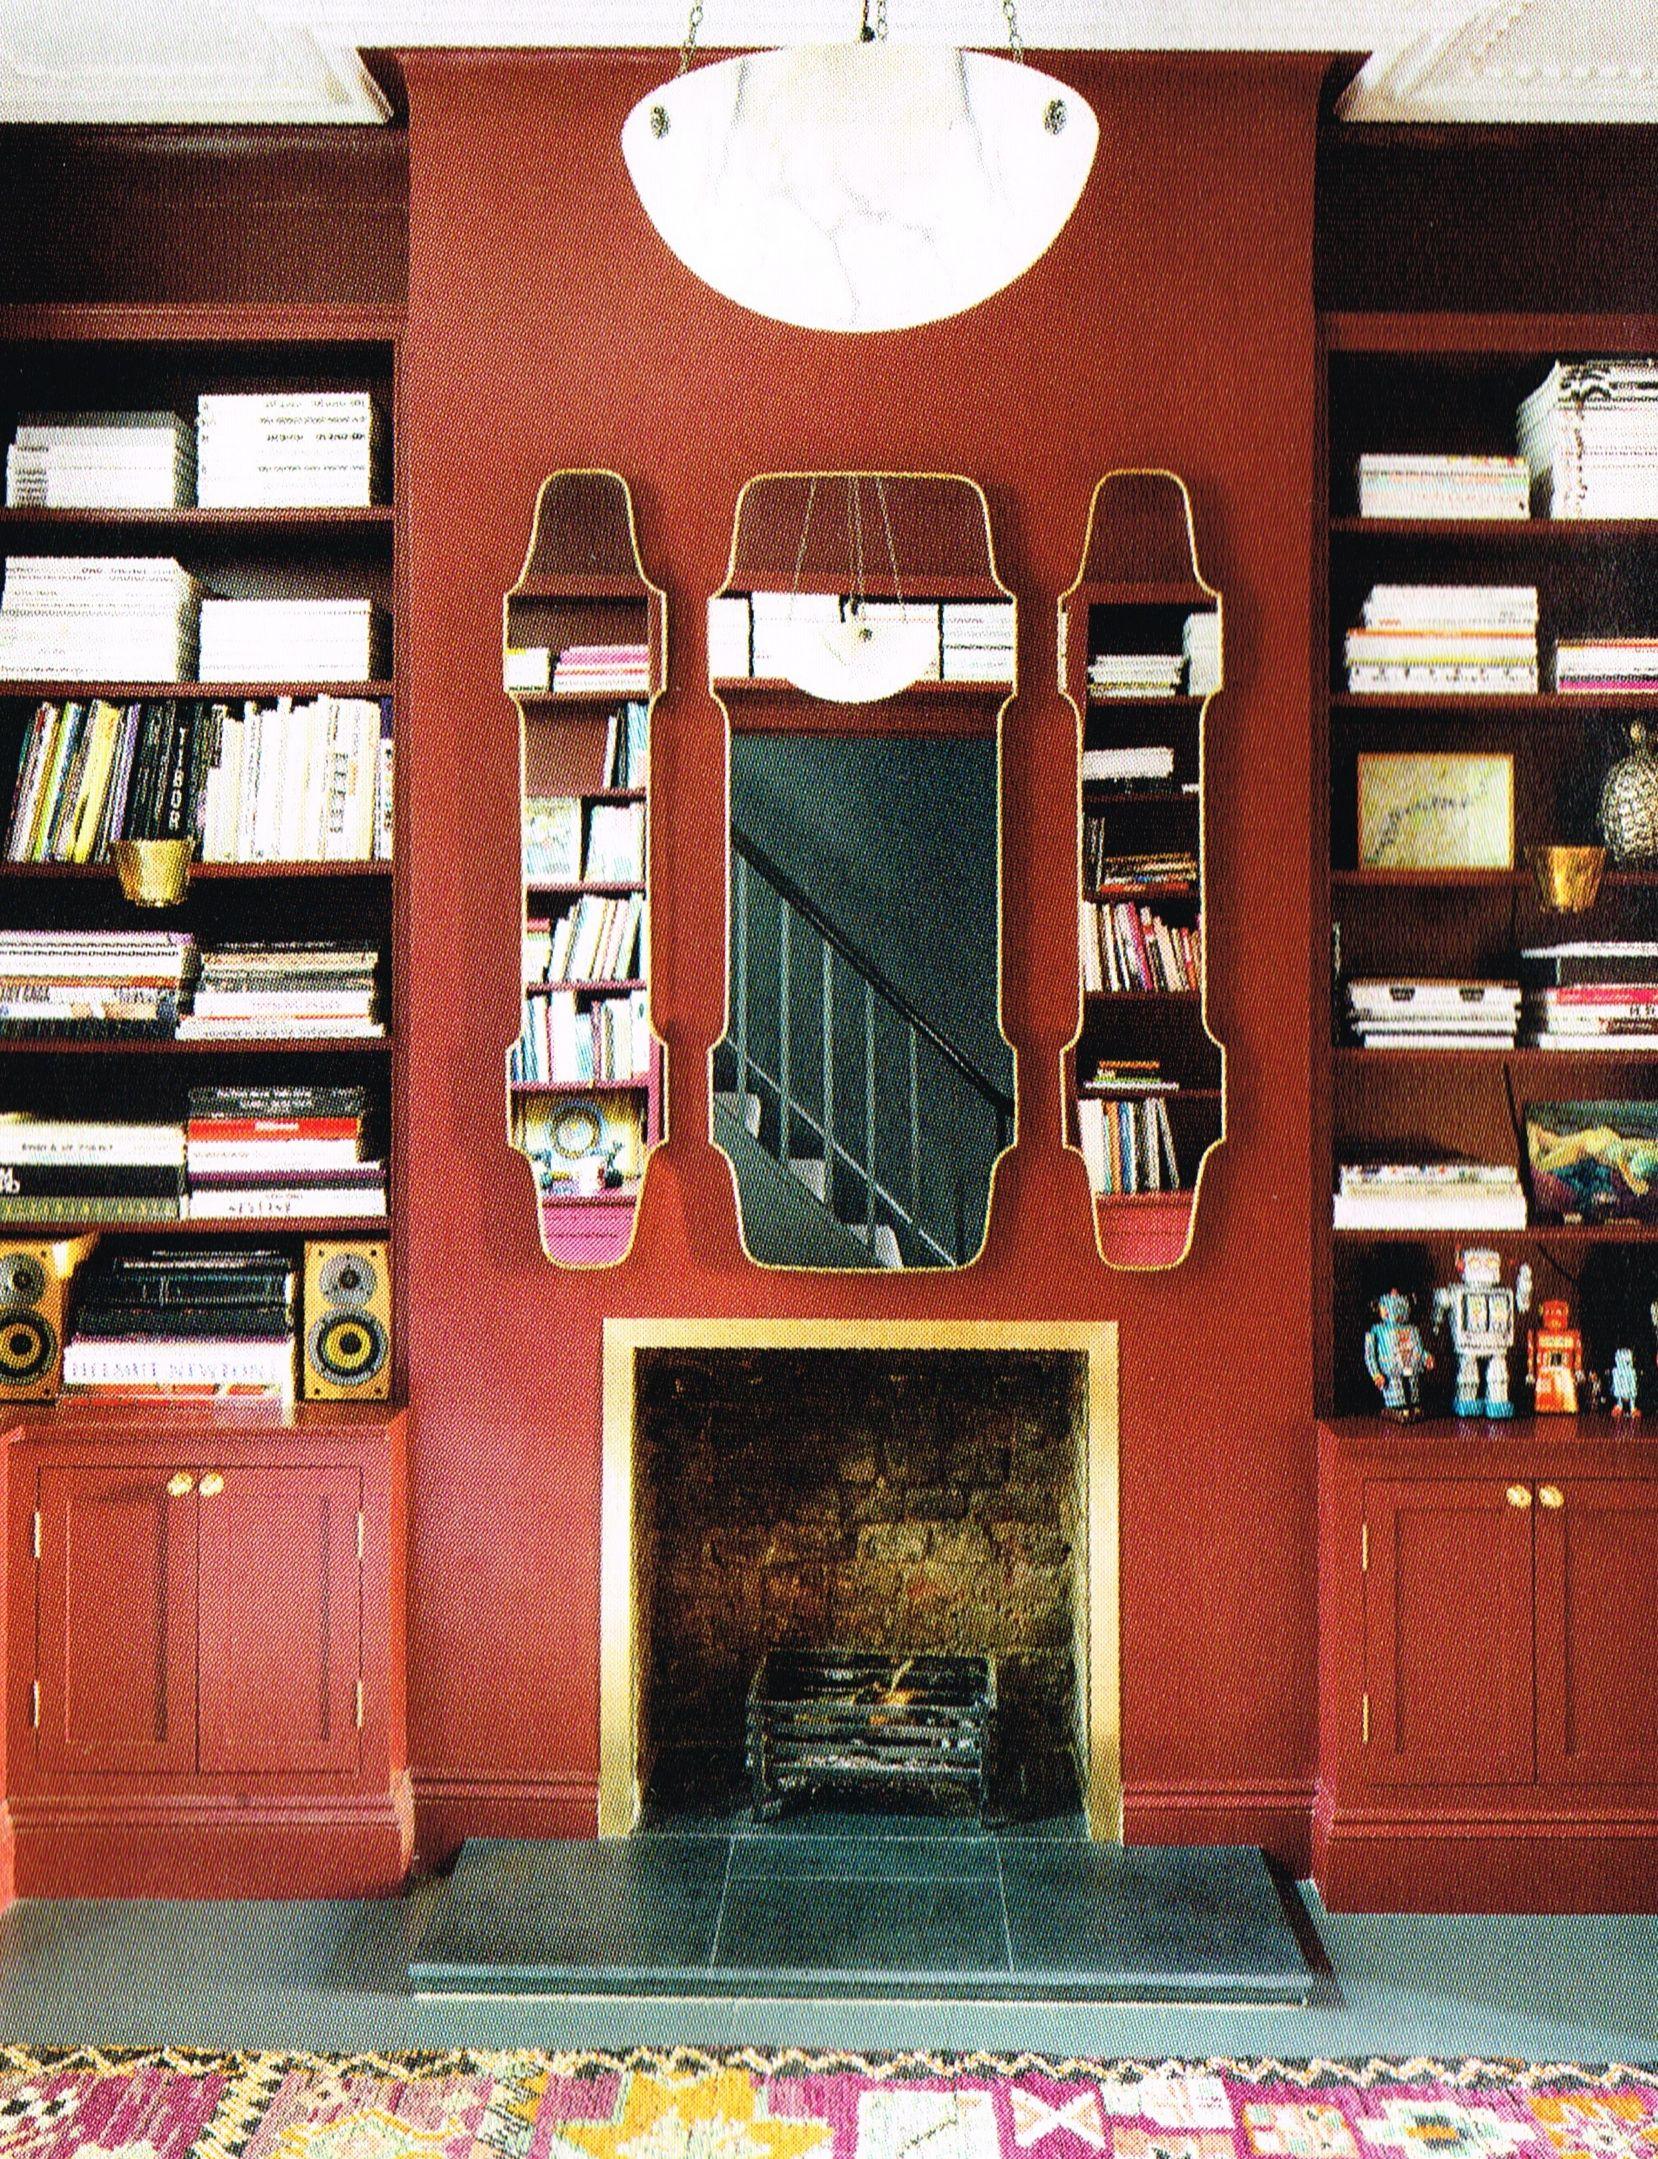 1840 Interior Design: Library In House In London, E9. Red Lacquer, Italian